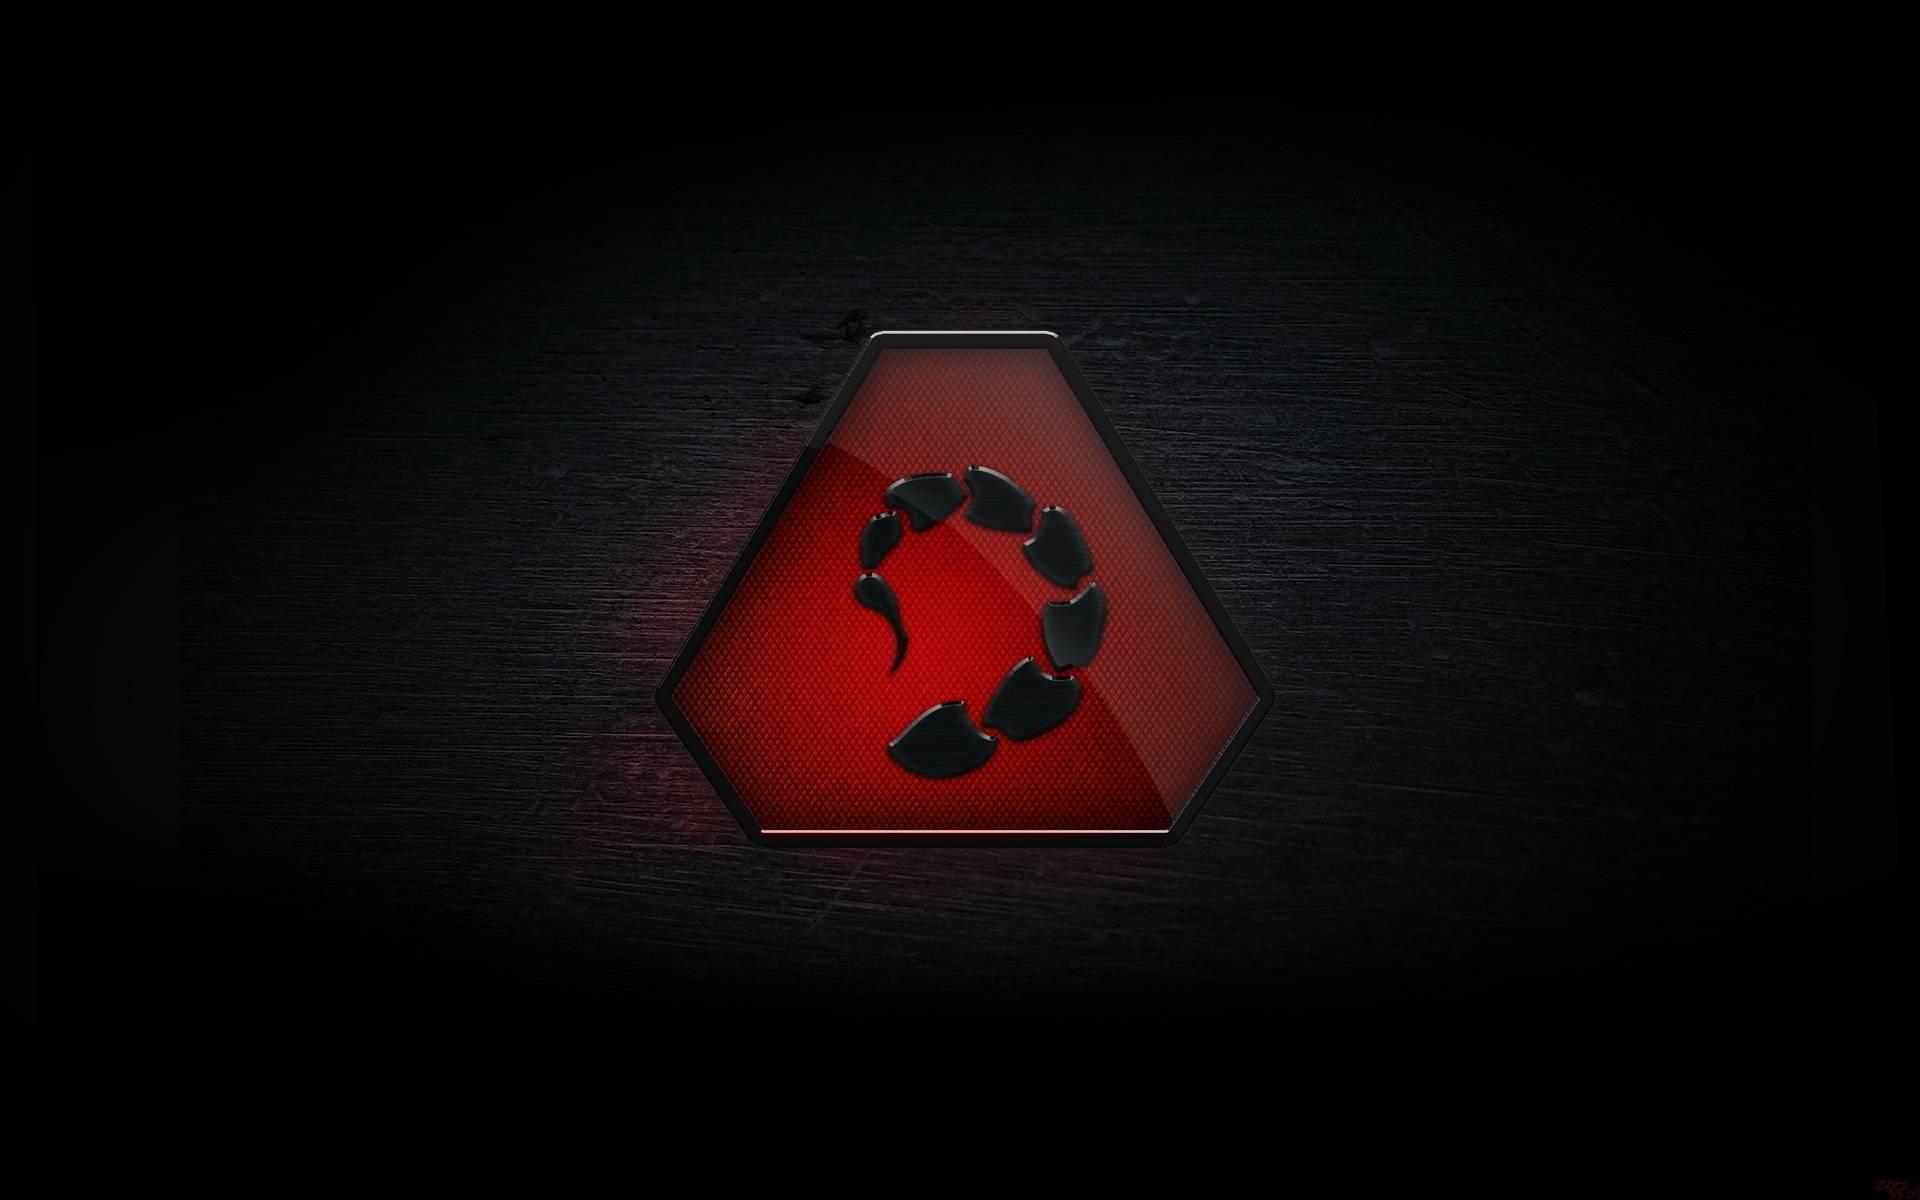 обои значок, хвост скорпиона, фон черный картинки фото